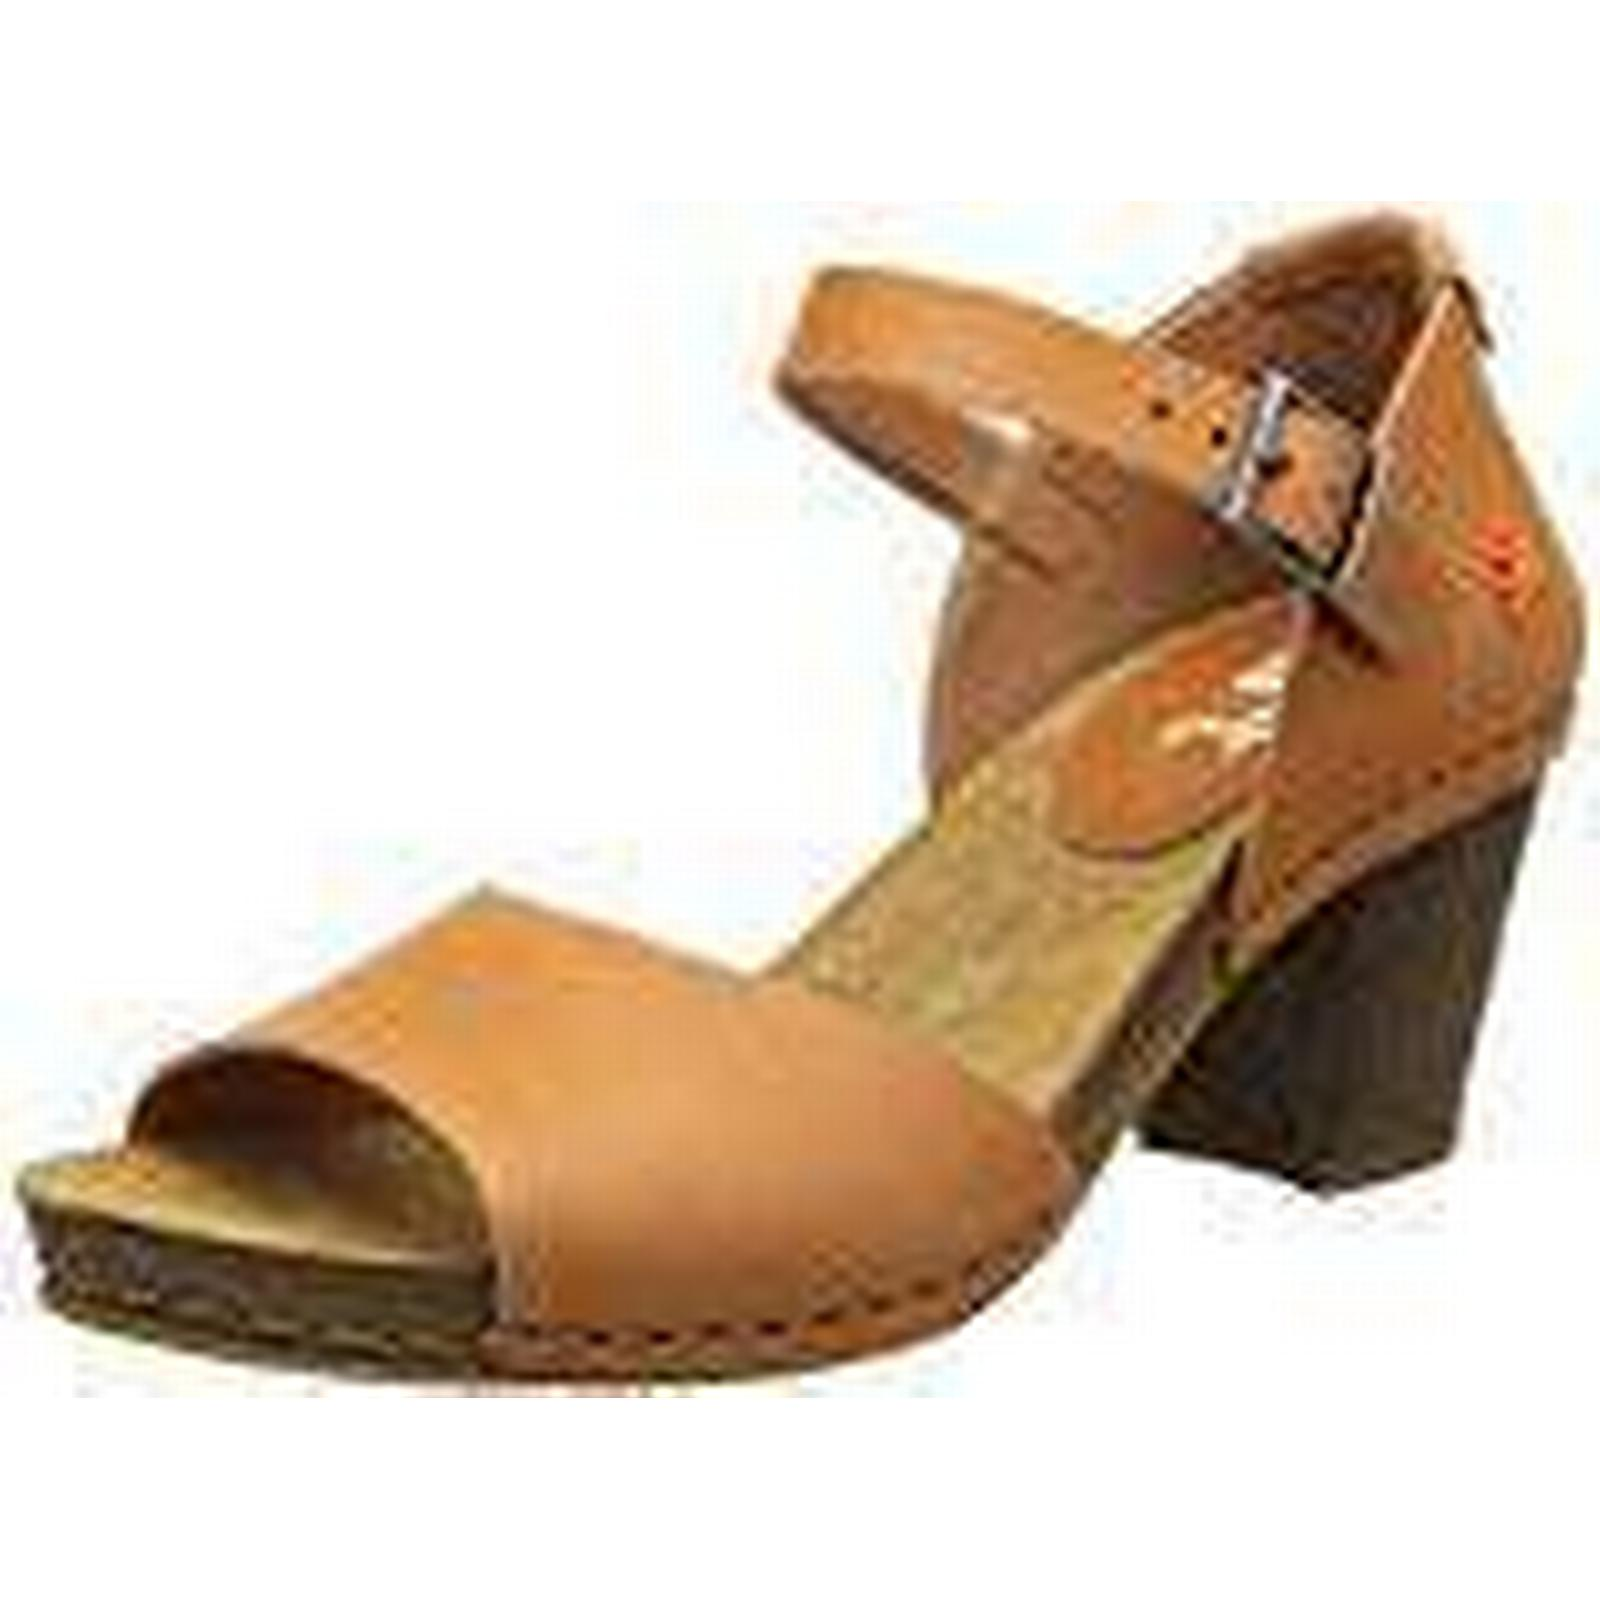 ART Pumps, I Meet, Women's Ankle-Strap Pumps, ART Brown (Cuero), 7 UK (40 EU) 5757b7